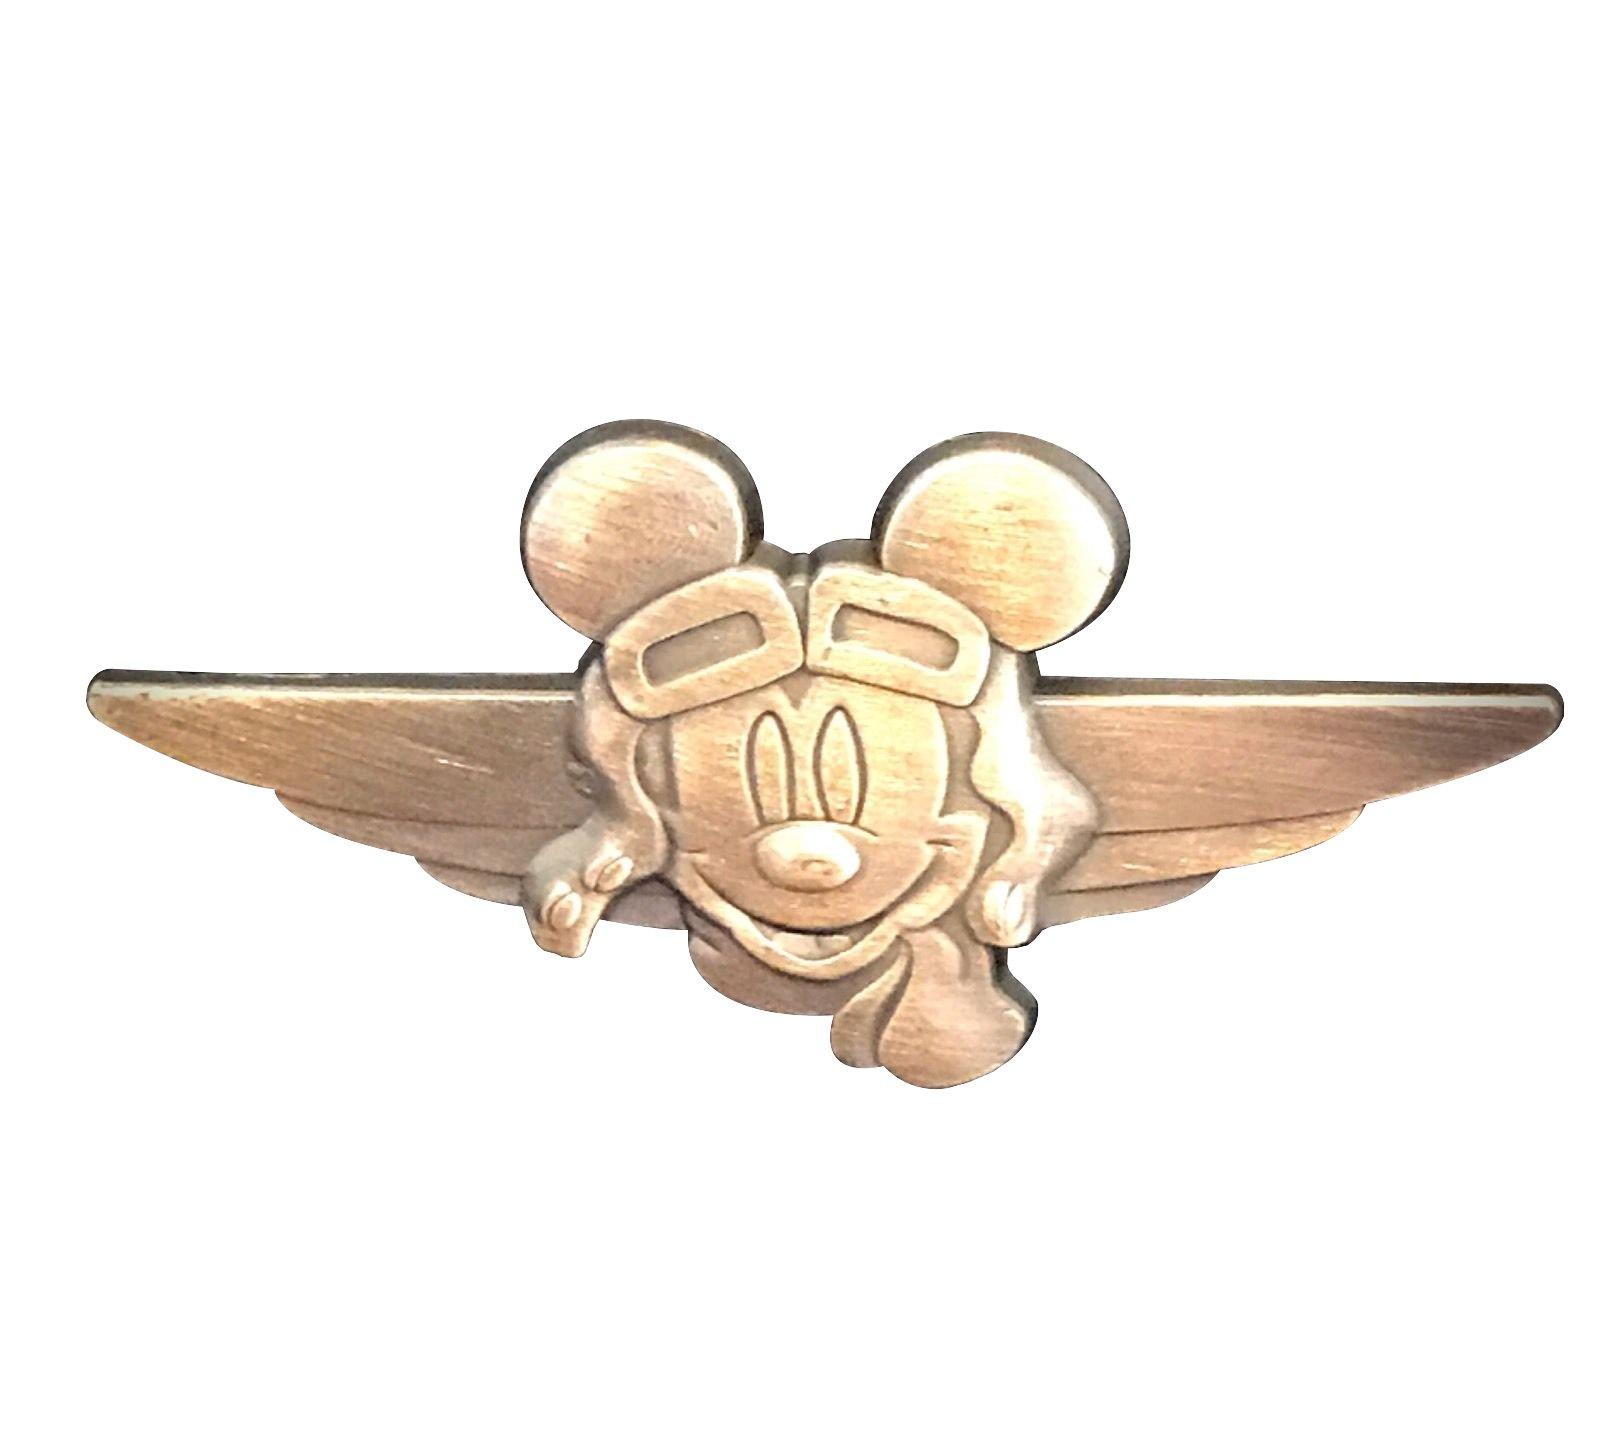 Disney Pin Aviator Mickey Mouse - Bronze-Style *Pilot* Wings